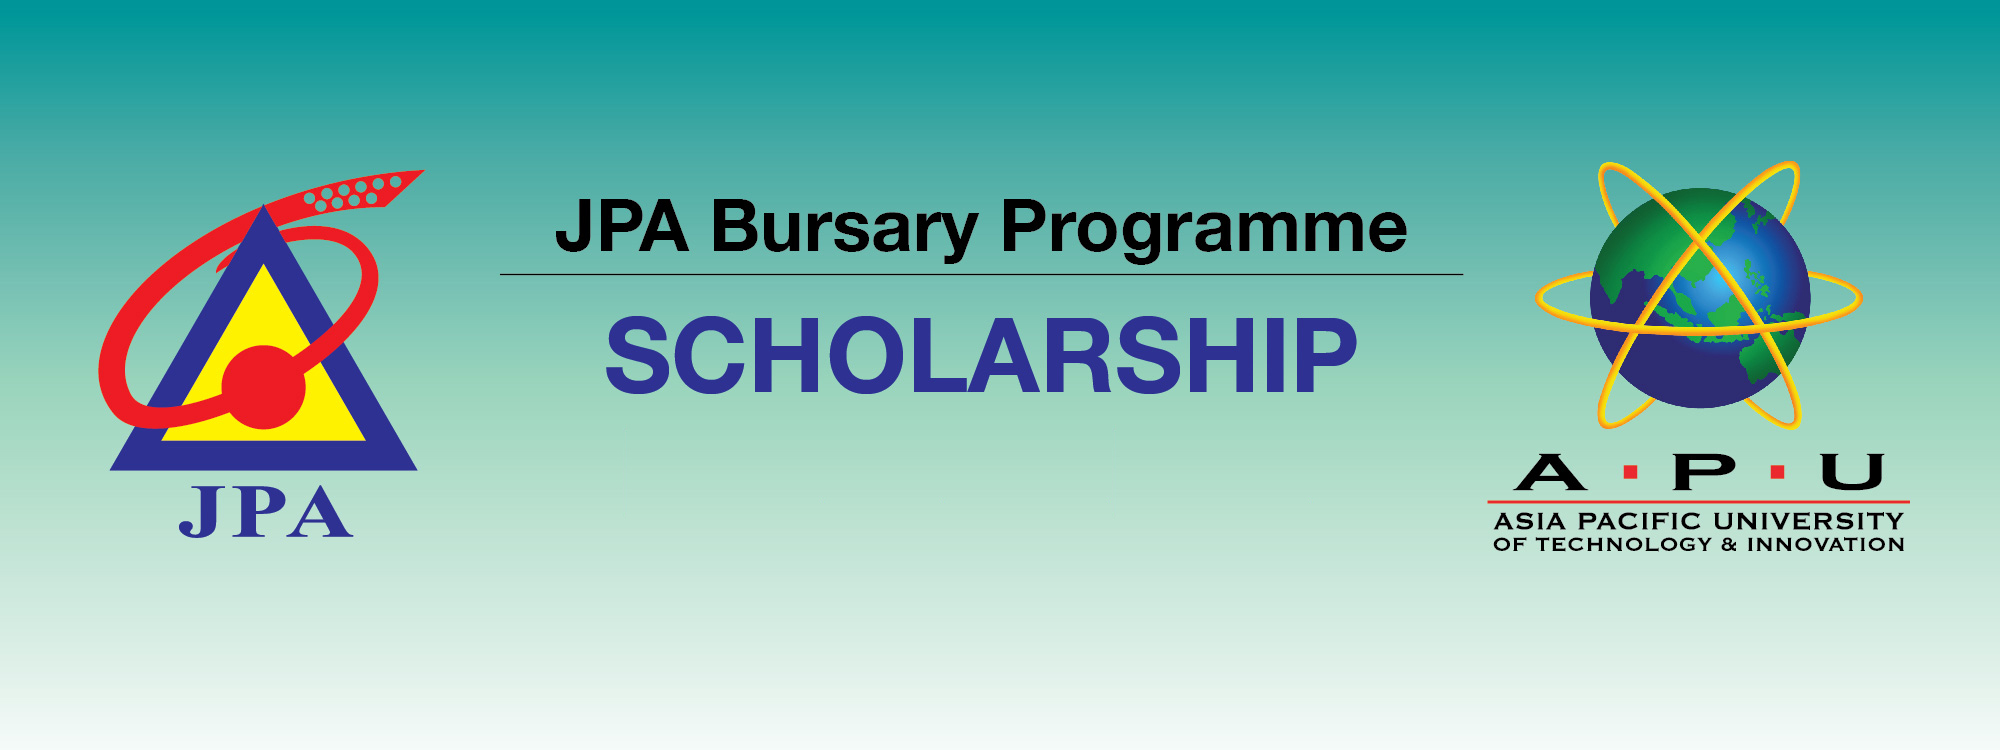 Jpa Bursary Programme 2020 Asia Pacific University Apu